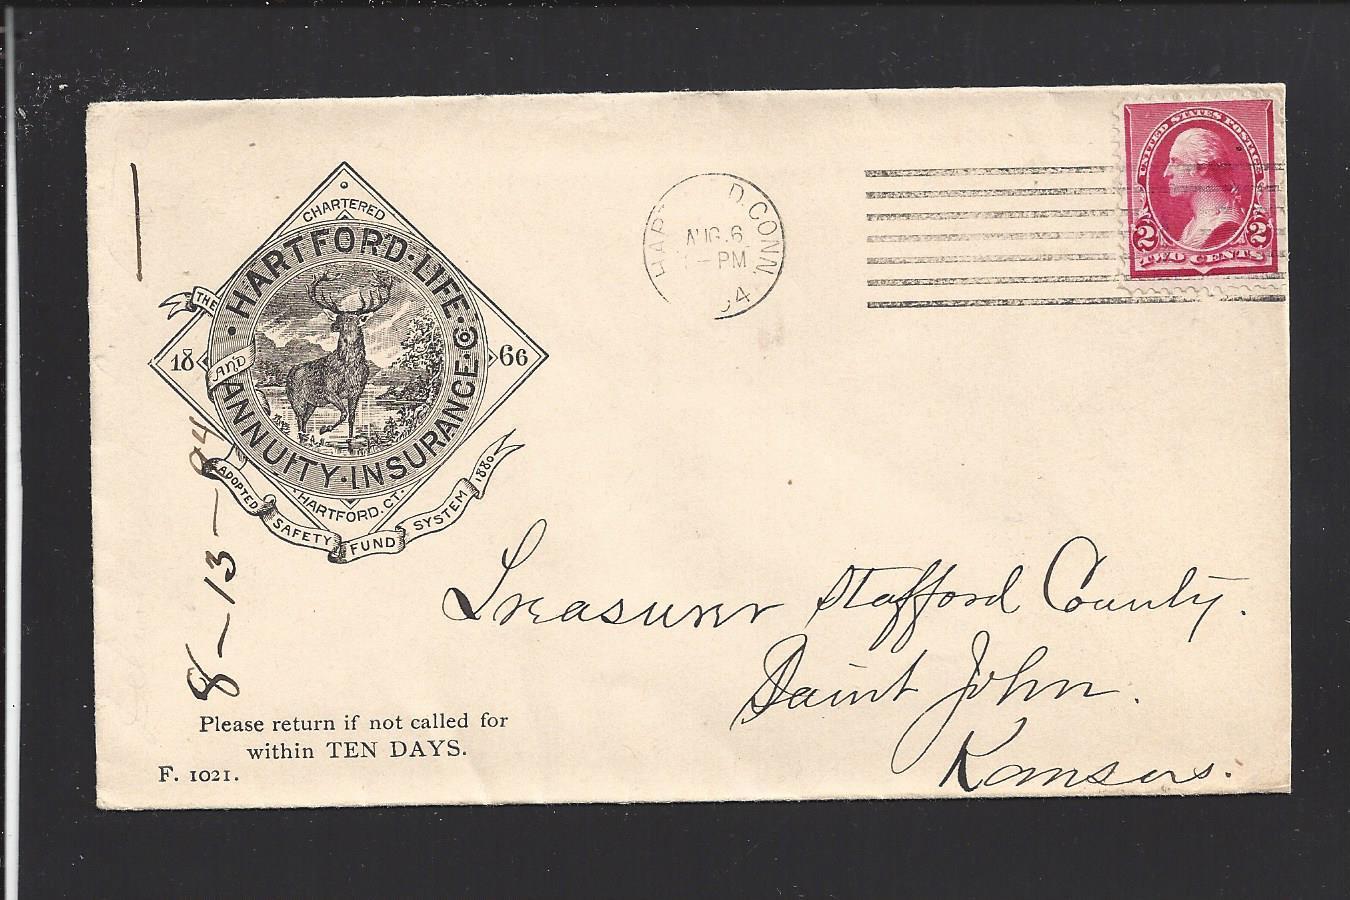 Hartford Annuity Login >> Details About Hartford Connecticut 1894 220 Advt Cover Hartford Life Annuity Insurance